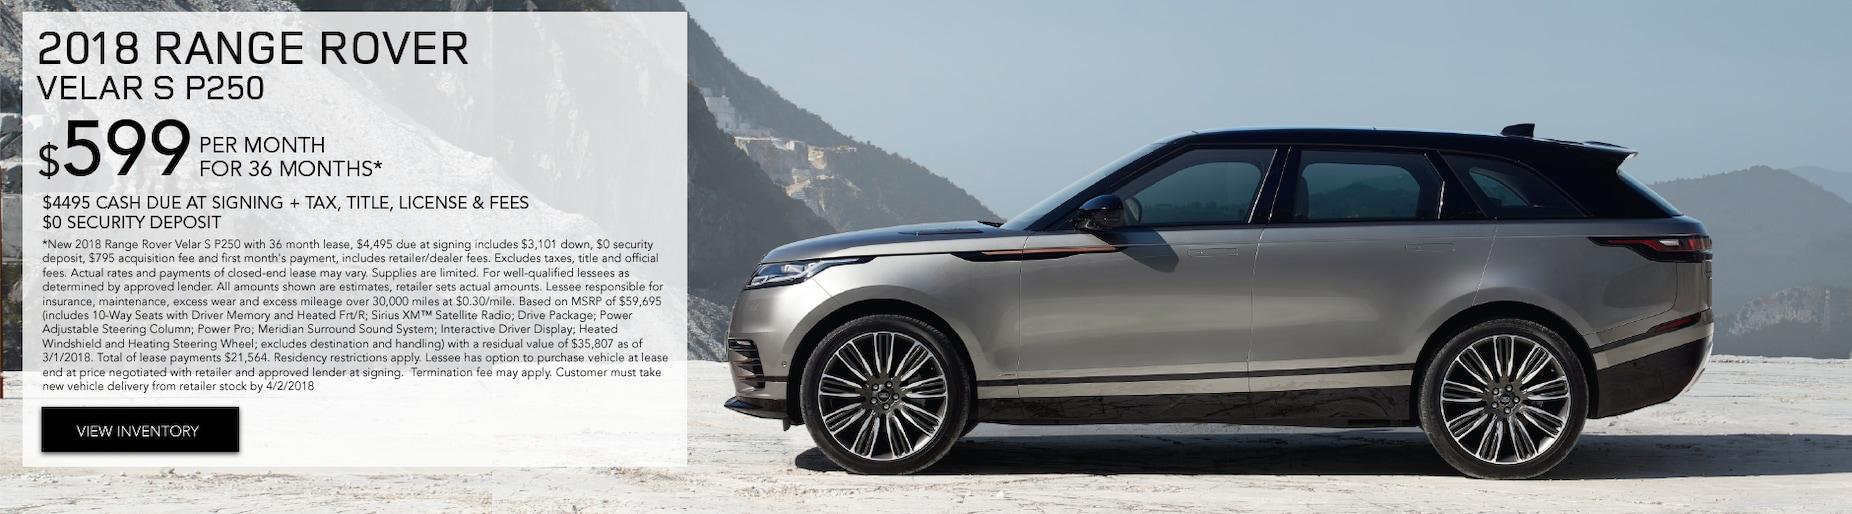 Land Rover Buckhead New Land Rover Dealership In Atlanta GA - Range rover inventory